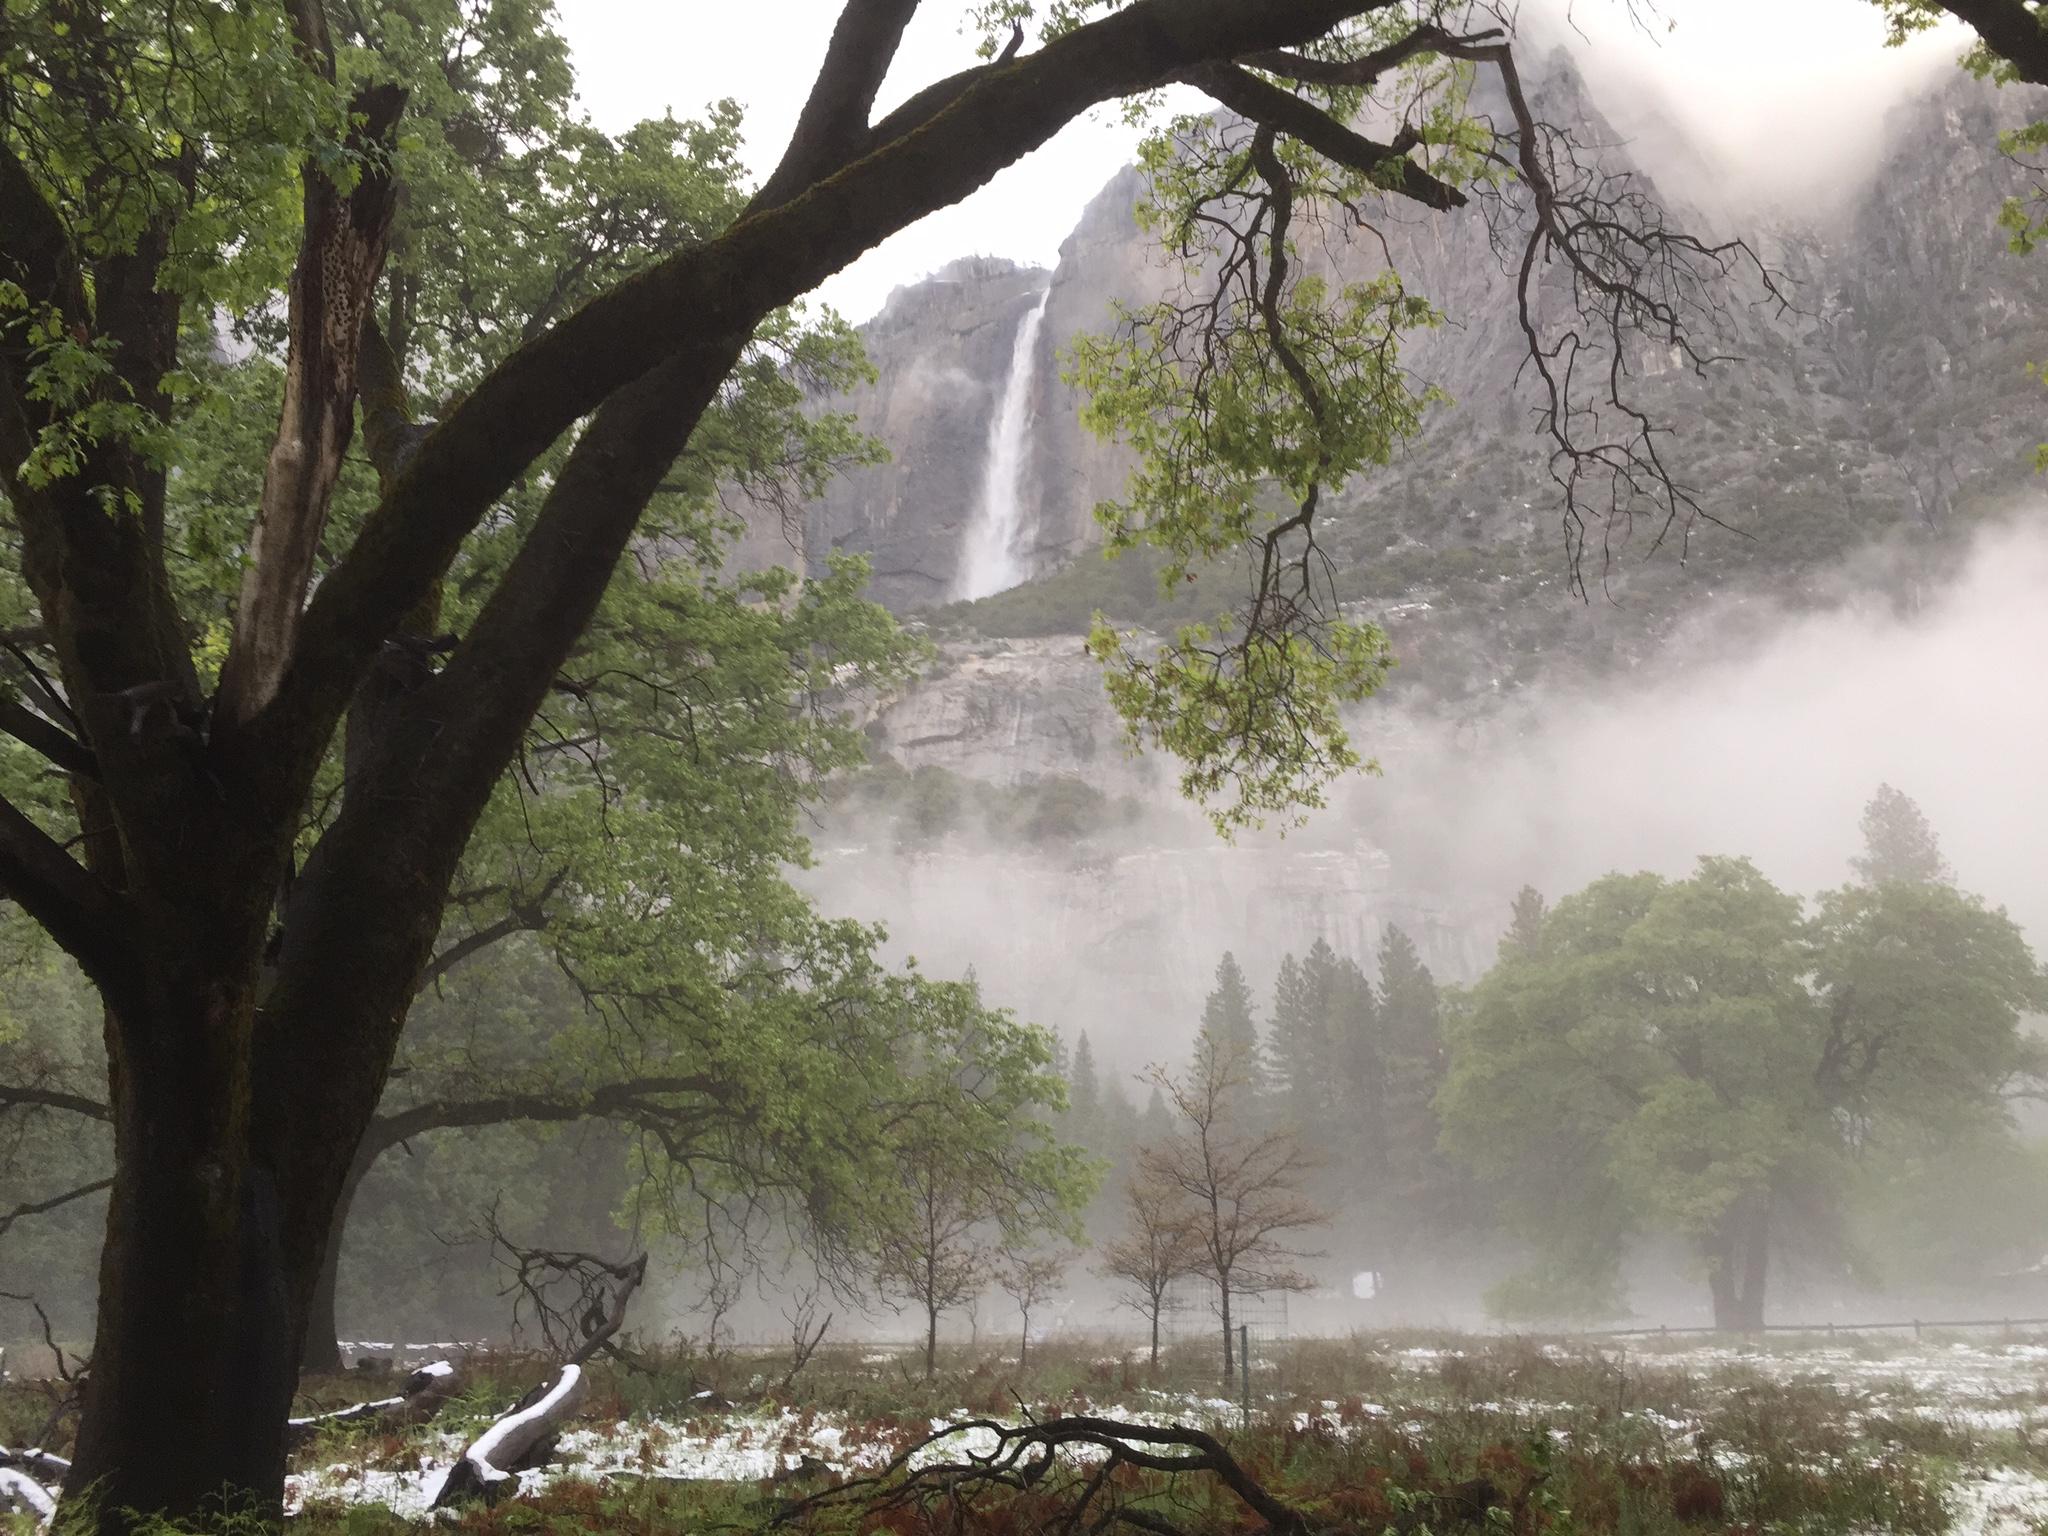 Yosemite falls as the night comes